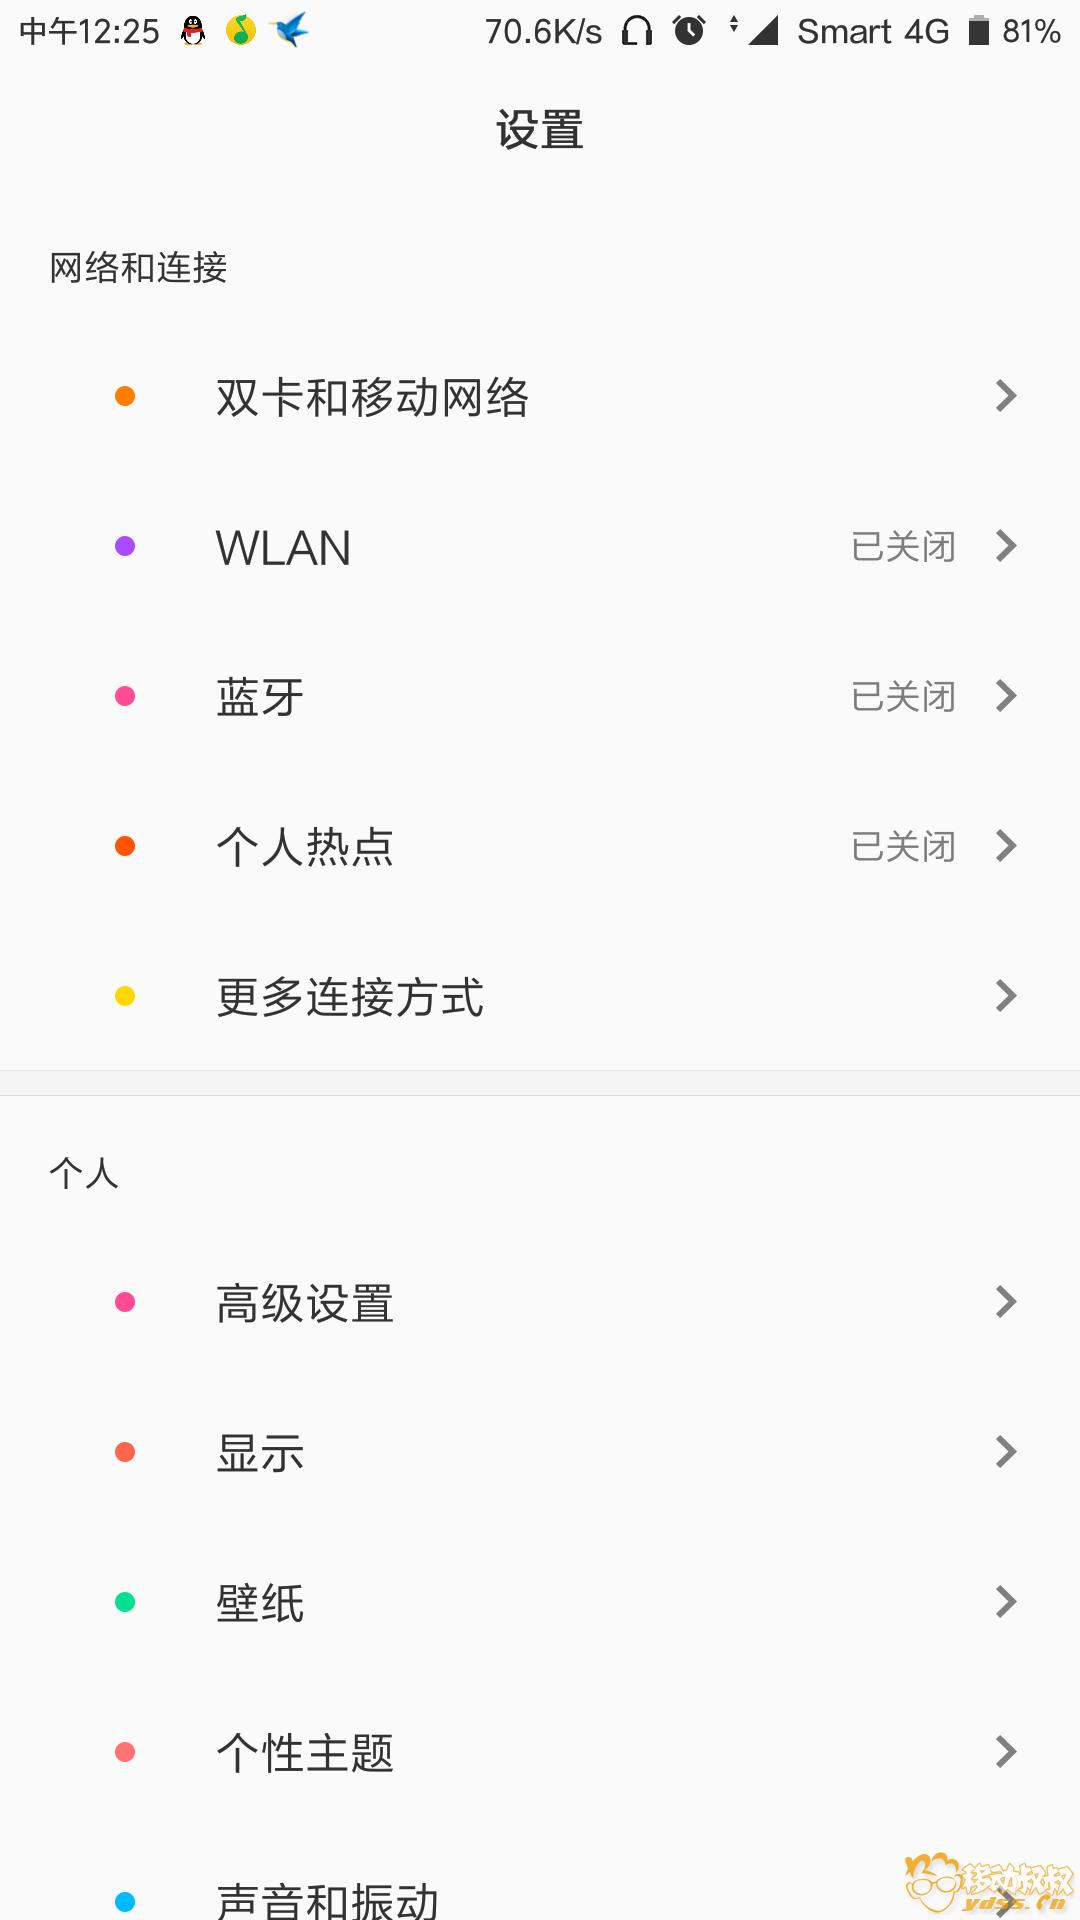 Screenshot_2018-02-07-12-25-52-651_com.android.settings.png